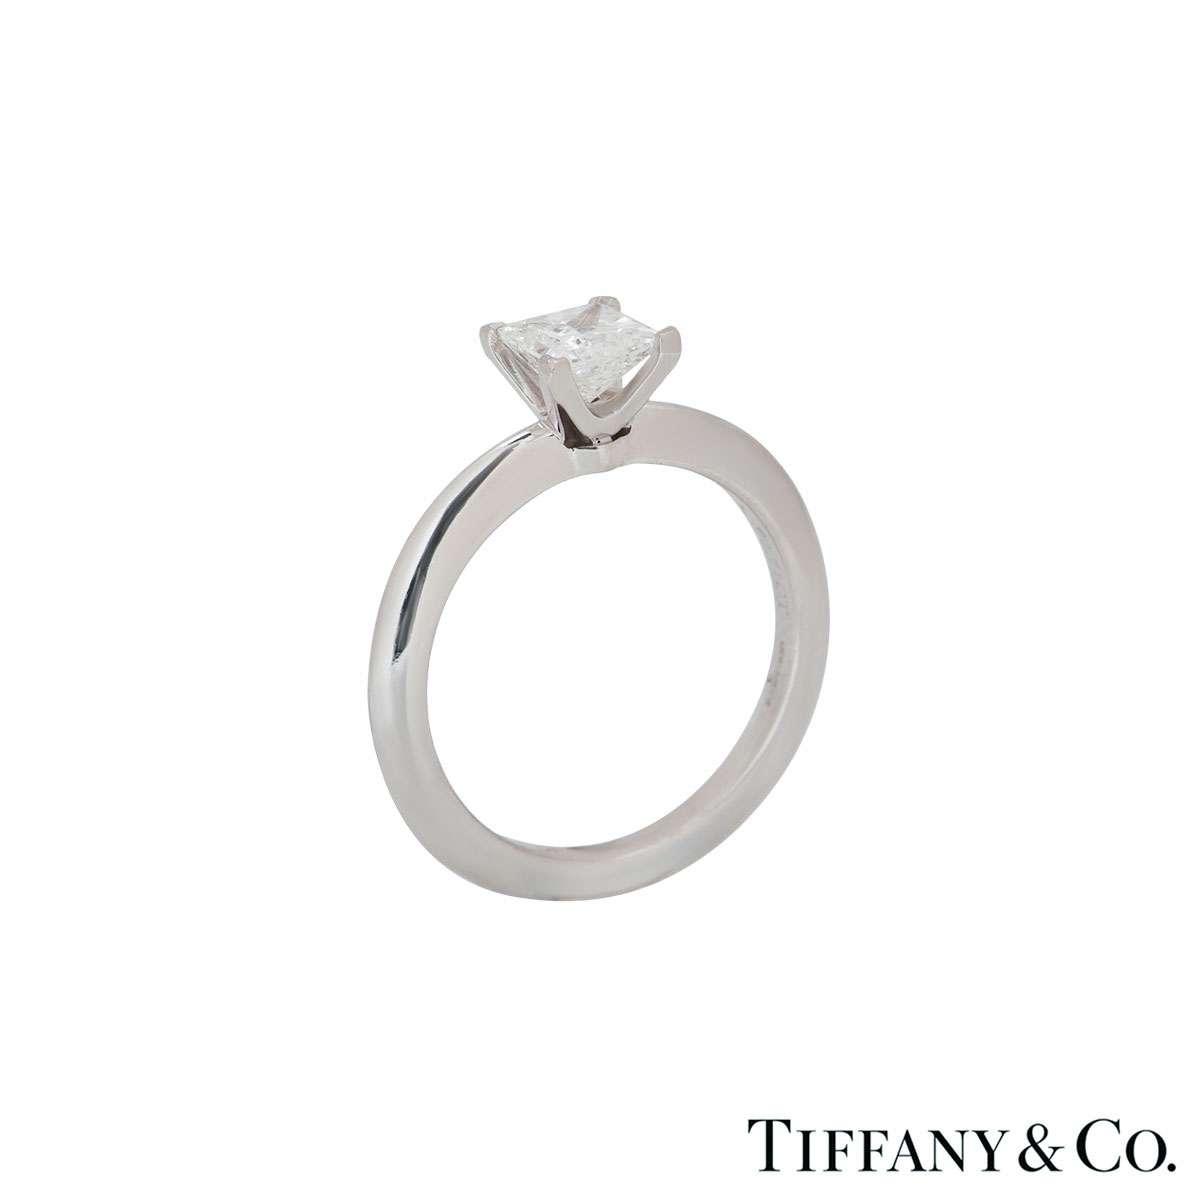 Tiffany & Co. Platinum Princess Cut Diamond Ring 0.71ct G/VVS1